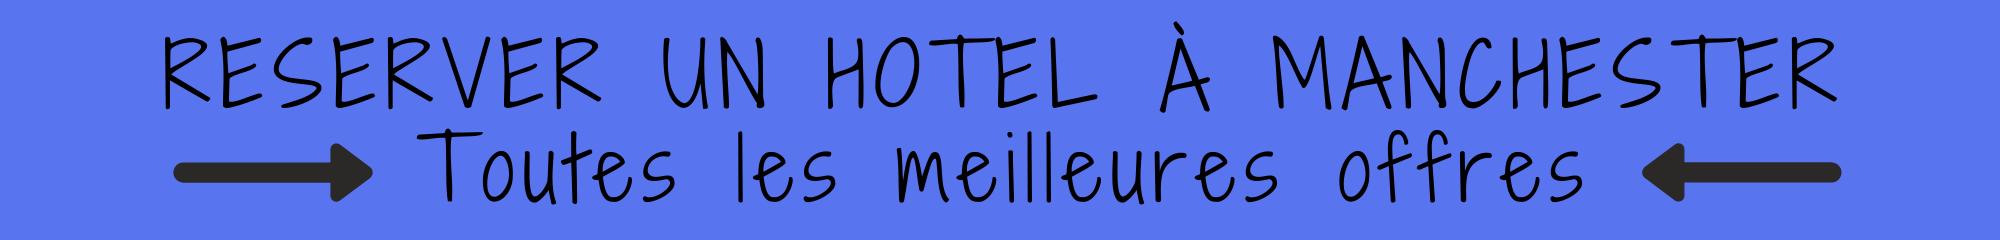 reserver-hotel-manchester